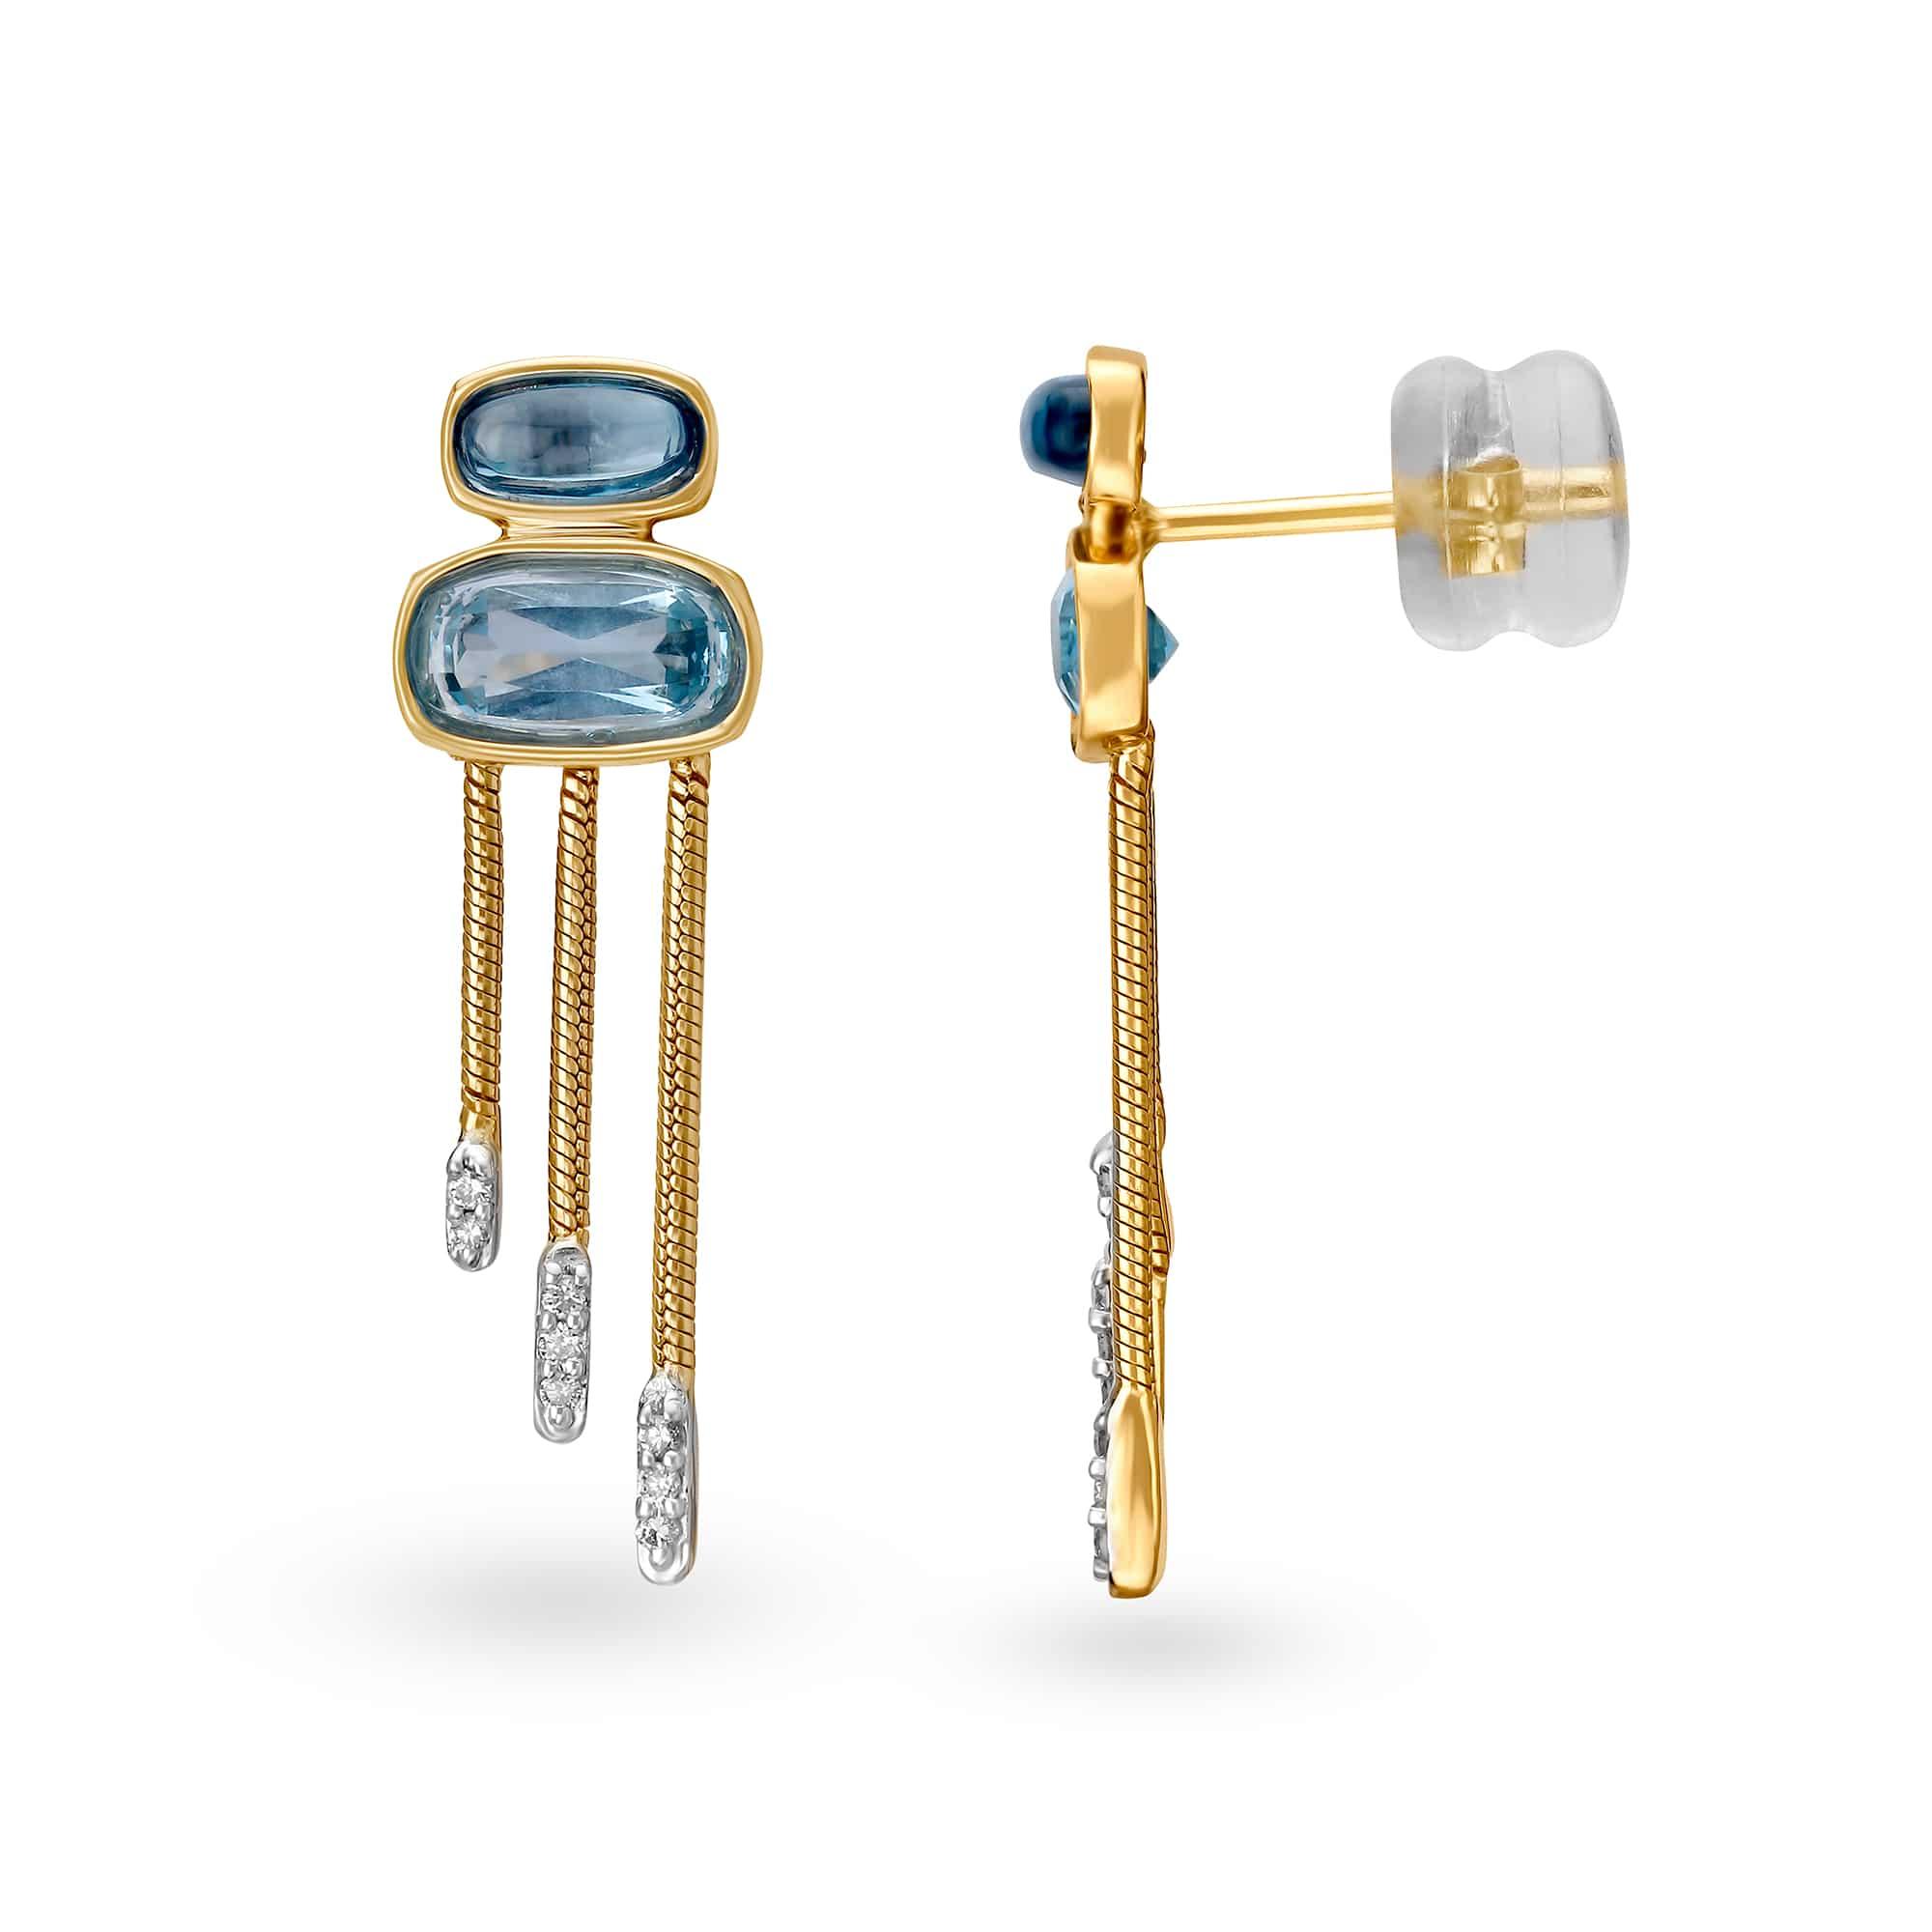 bb4aa4423f795 Mia by Tanishq 14KT Yellow Gold Diamond Drop Earrings